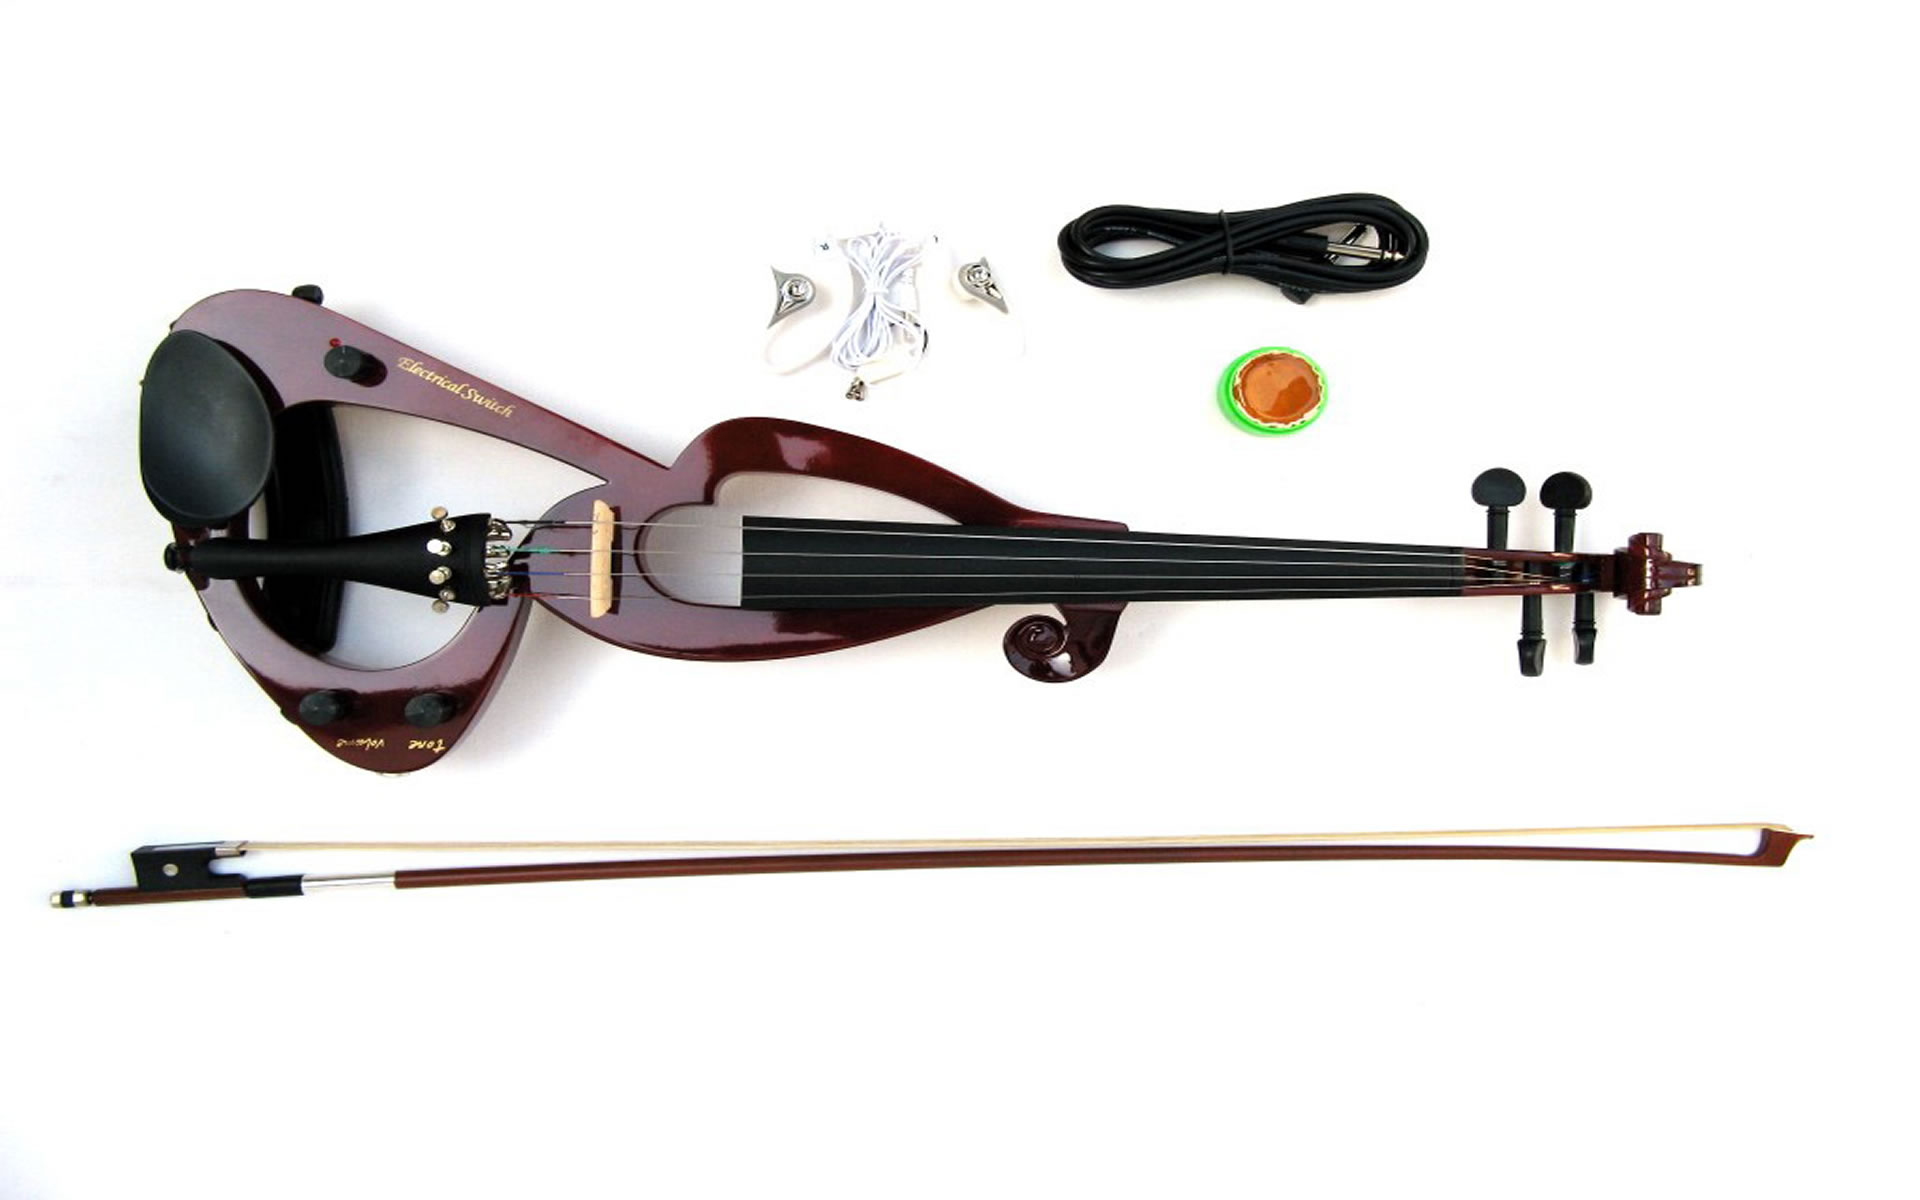 Melodías Huecas - Ade Skills  Violin-electrico-wallpaper